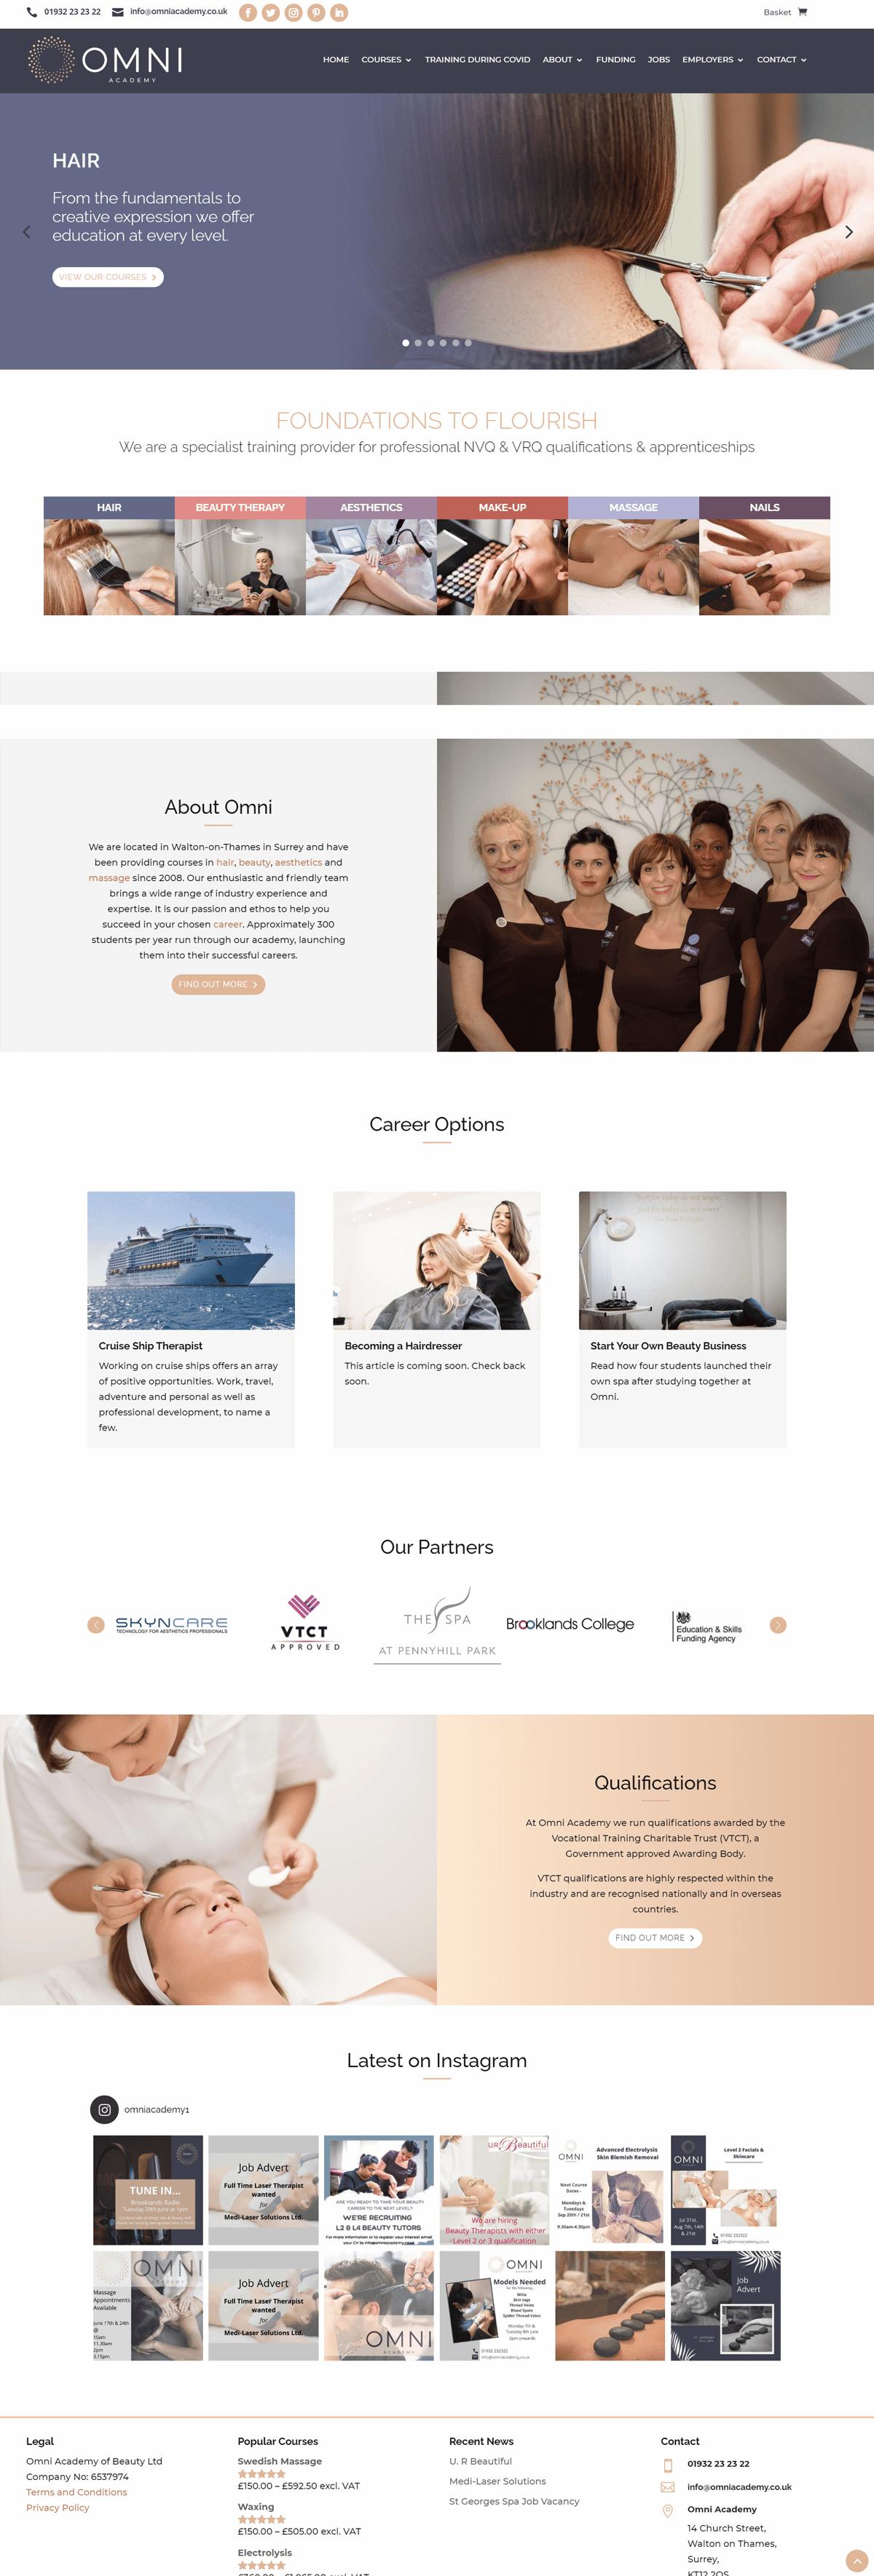 Screenshot of the Omni Academy of Beauty Website